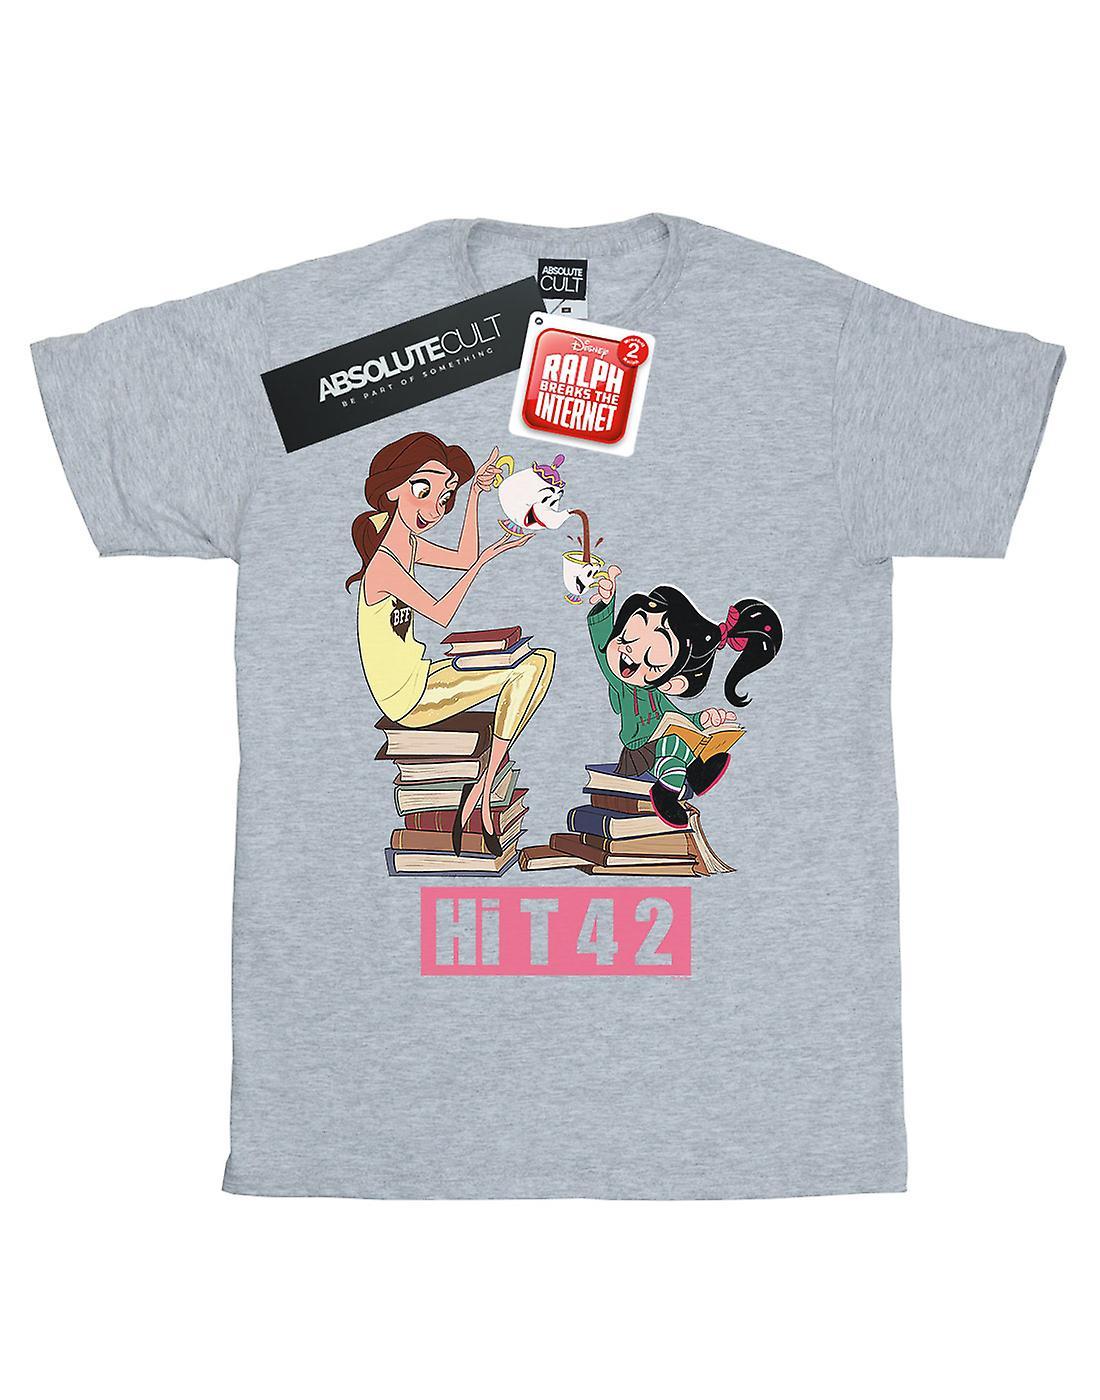 Disney Women's Wreck It Ralph Belle And Vanellope Boyfriend Fit T-Shirt